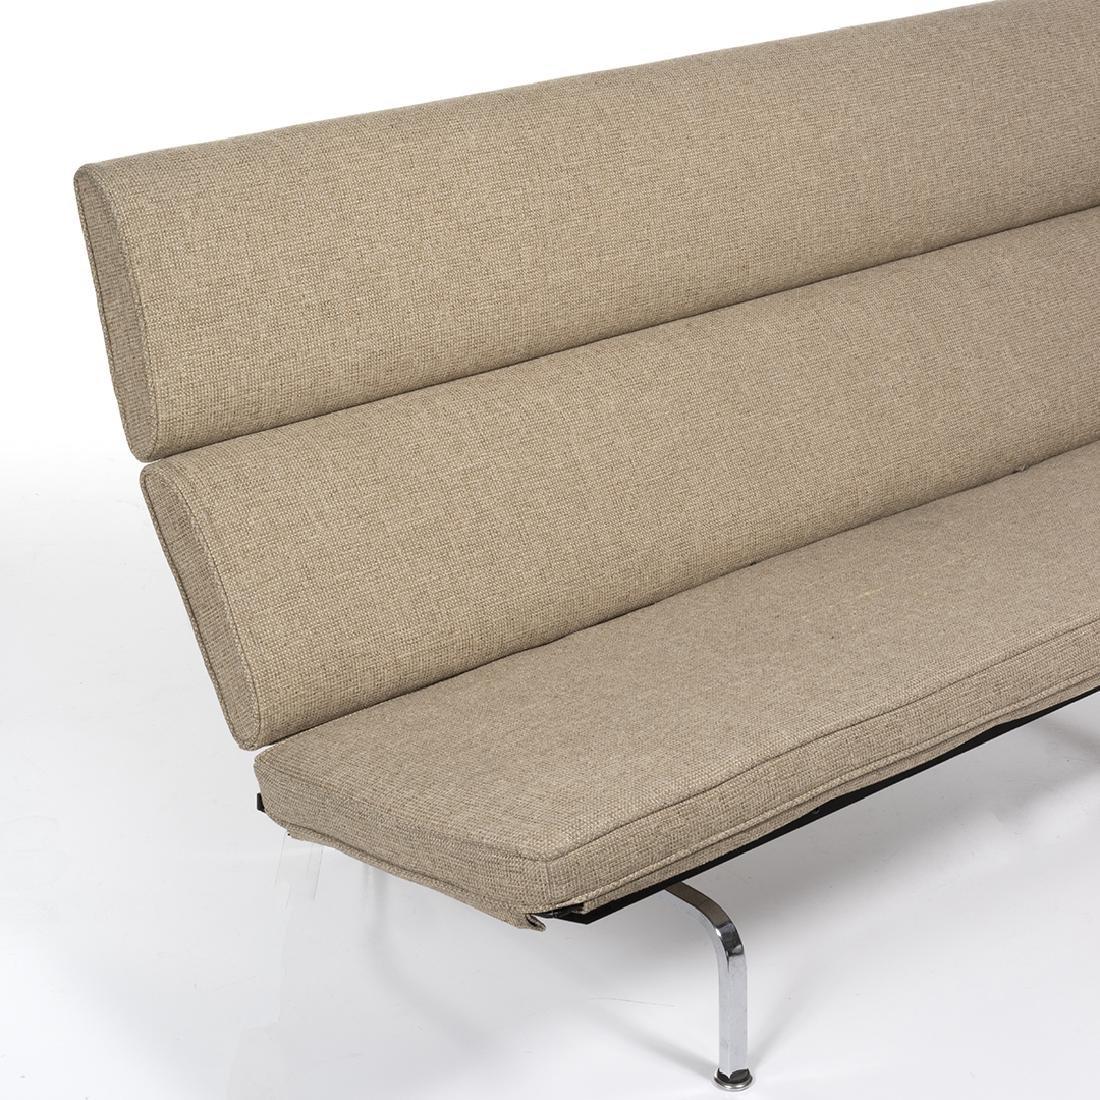 Eames Compact Sofa - 4